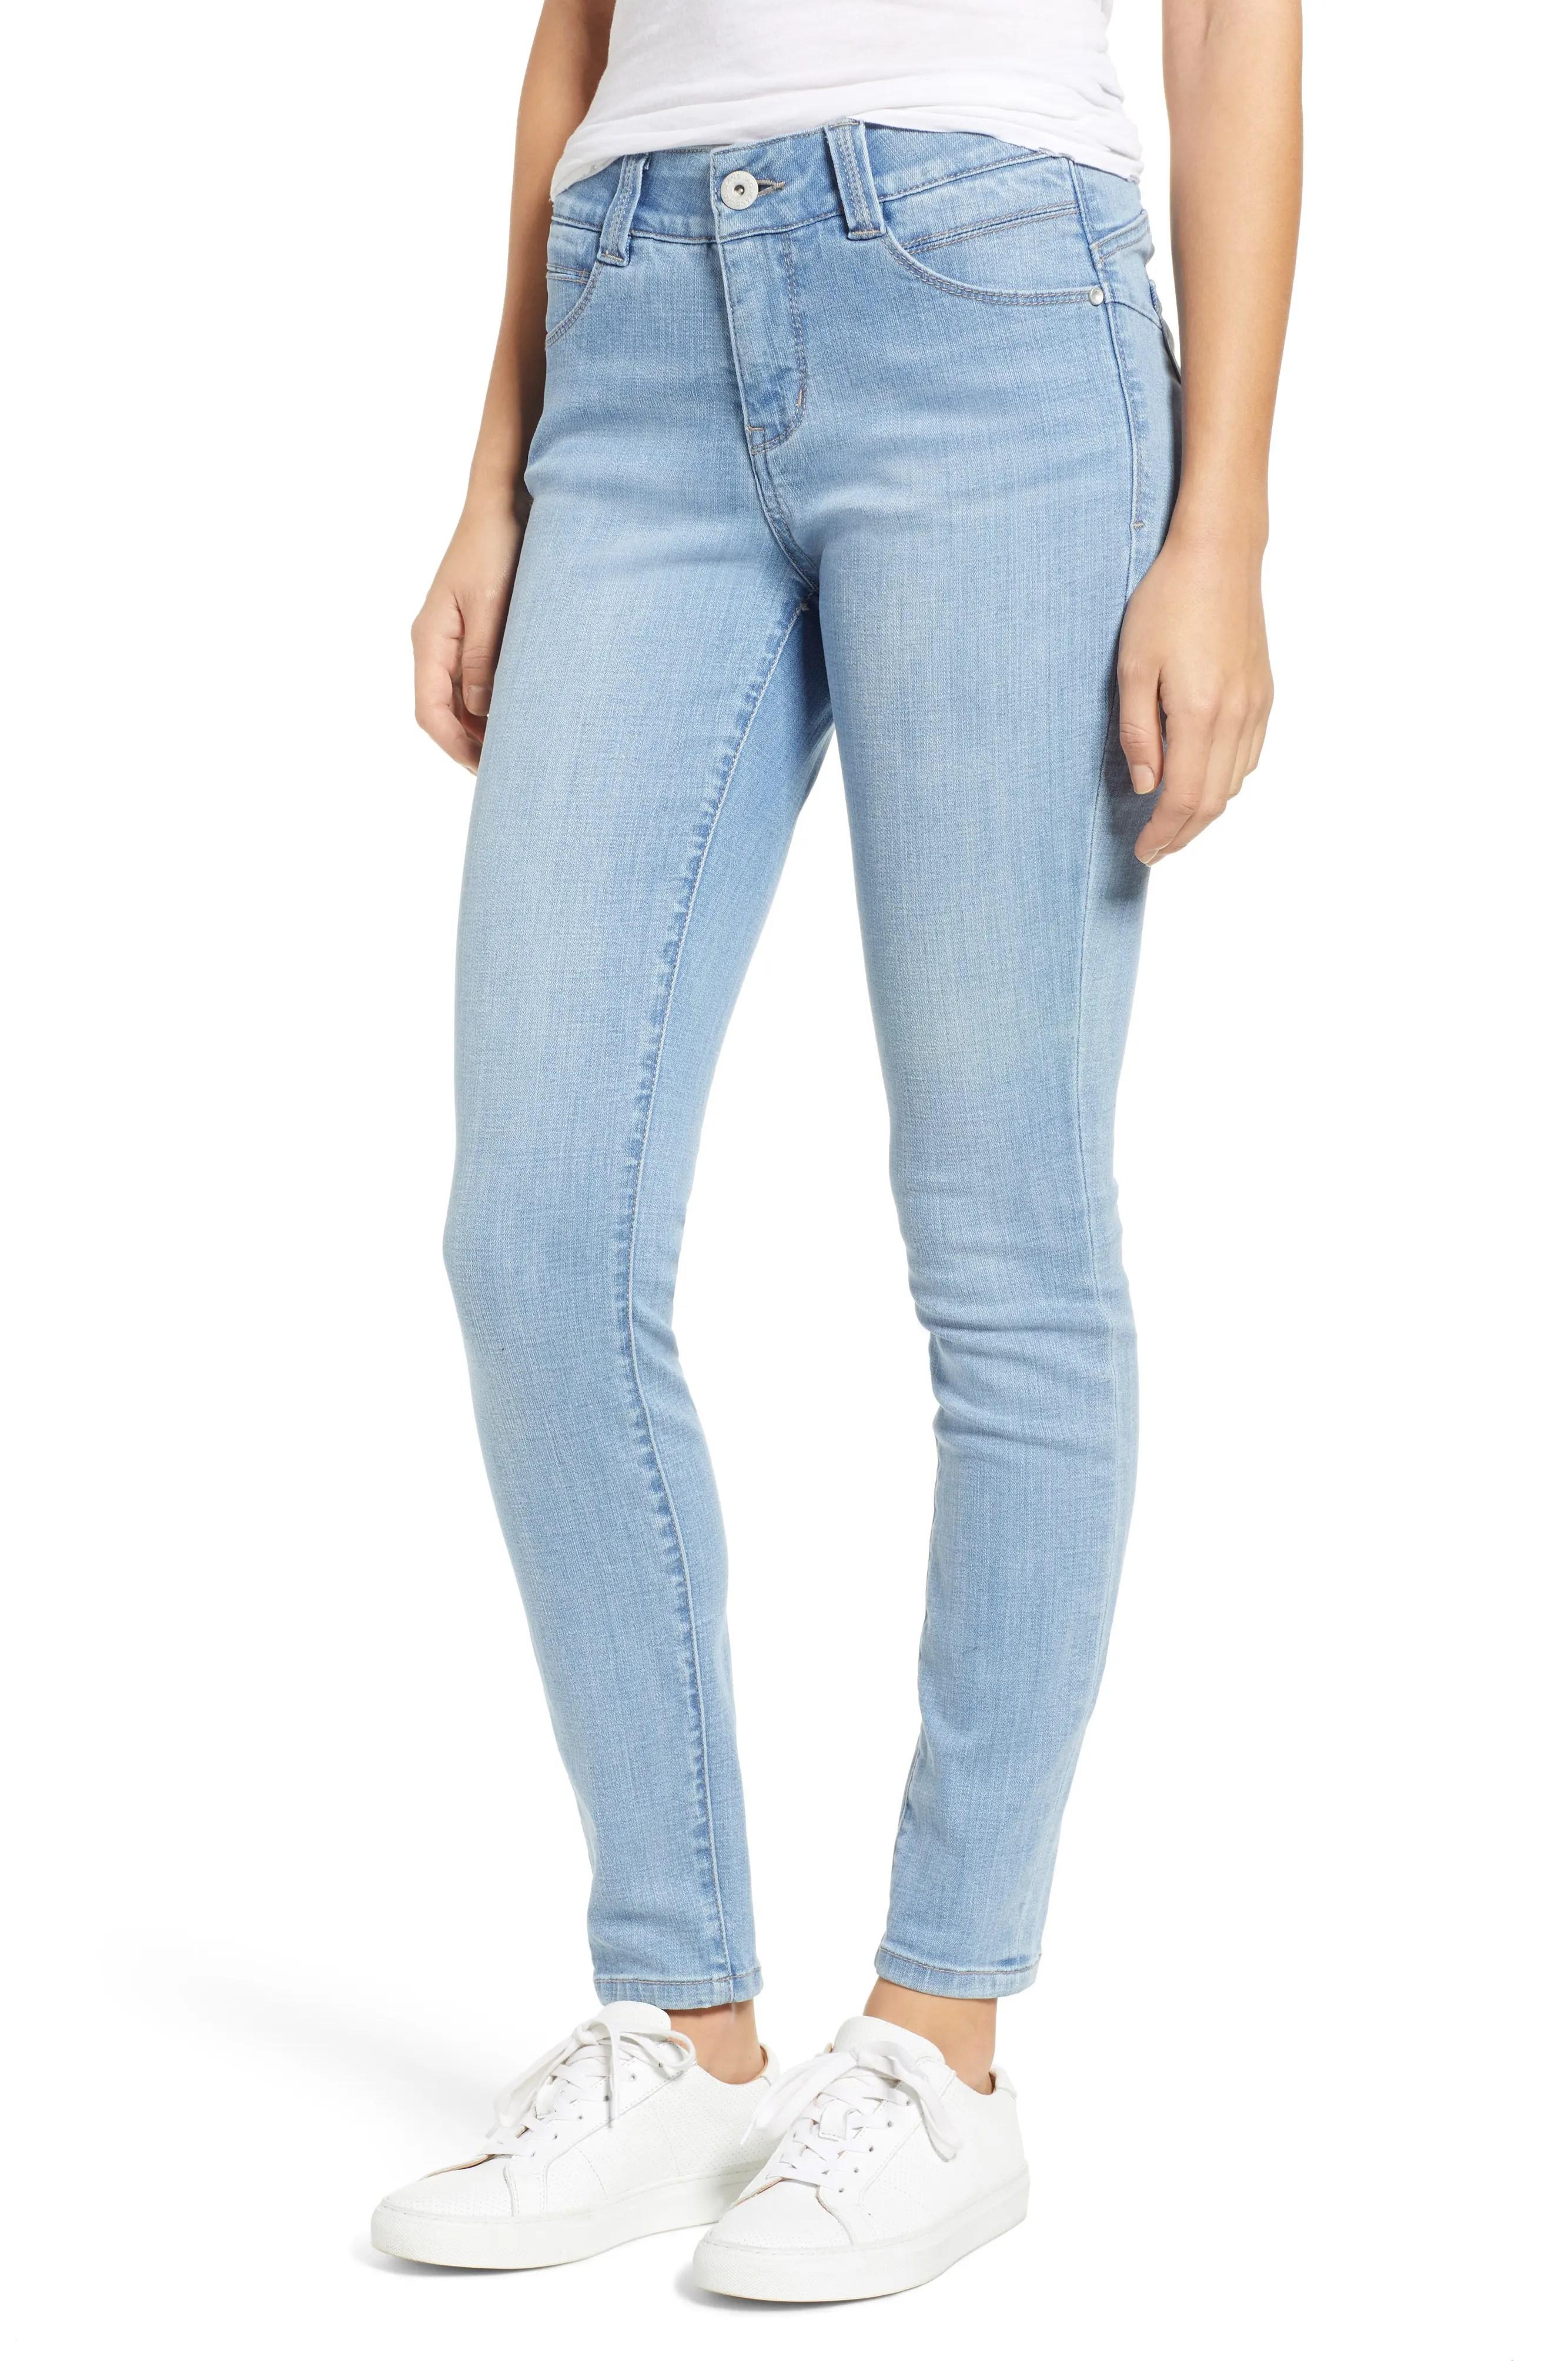 Jag jeans cecilia skinny island blue also clothing nordstrom rh shoprdstrom